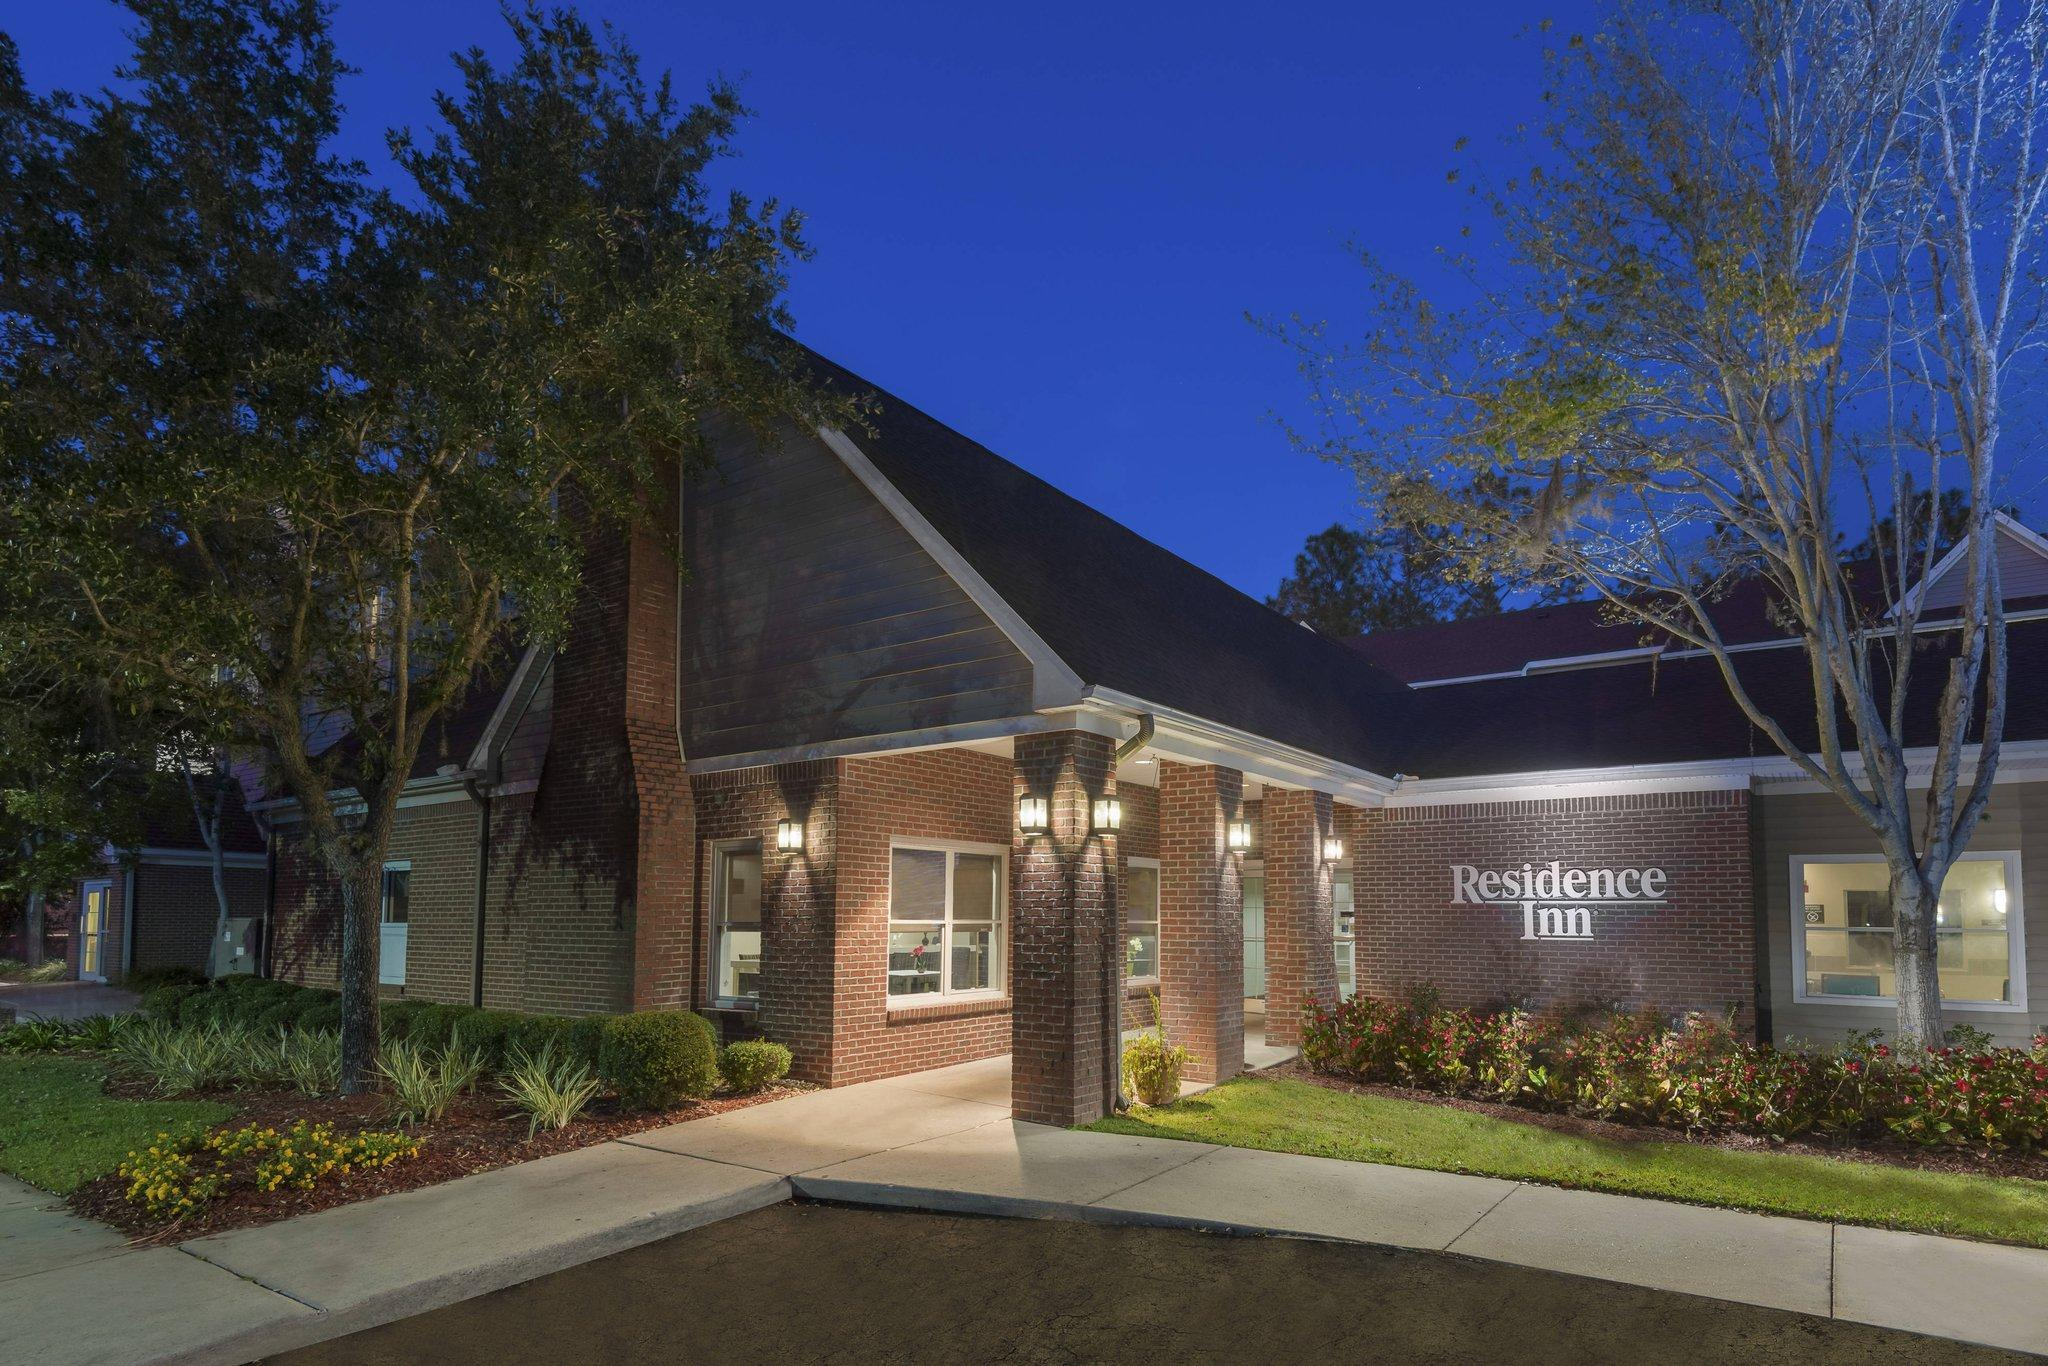 Residence Inn Tallahassee North I 10 Capital Circle